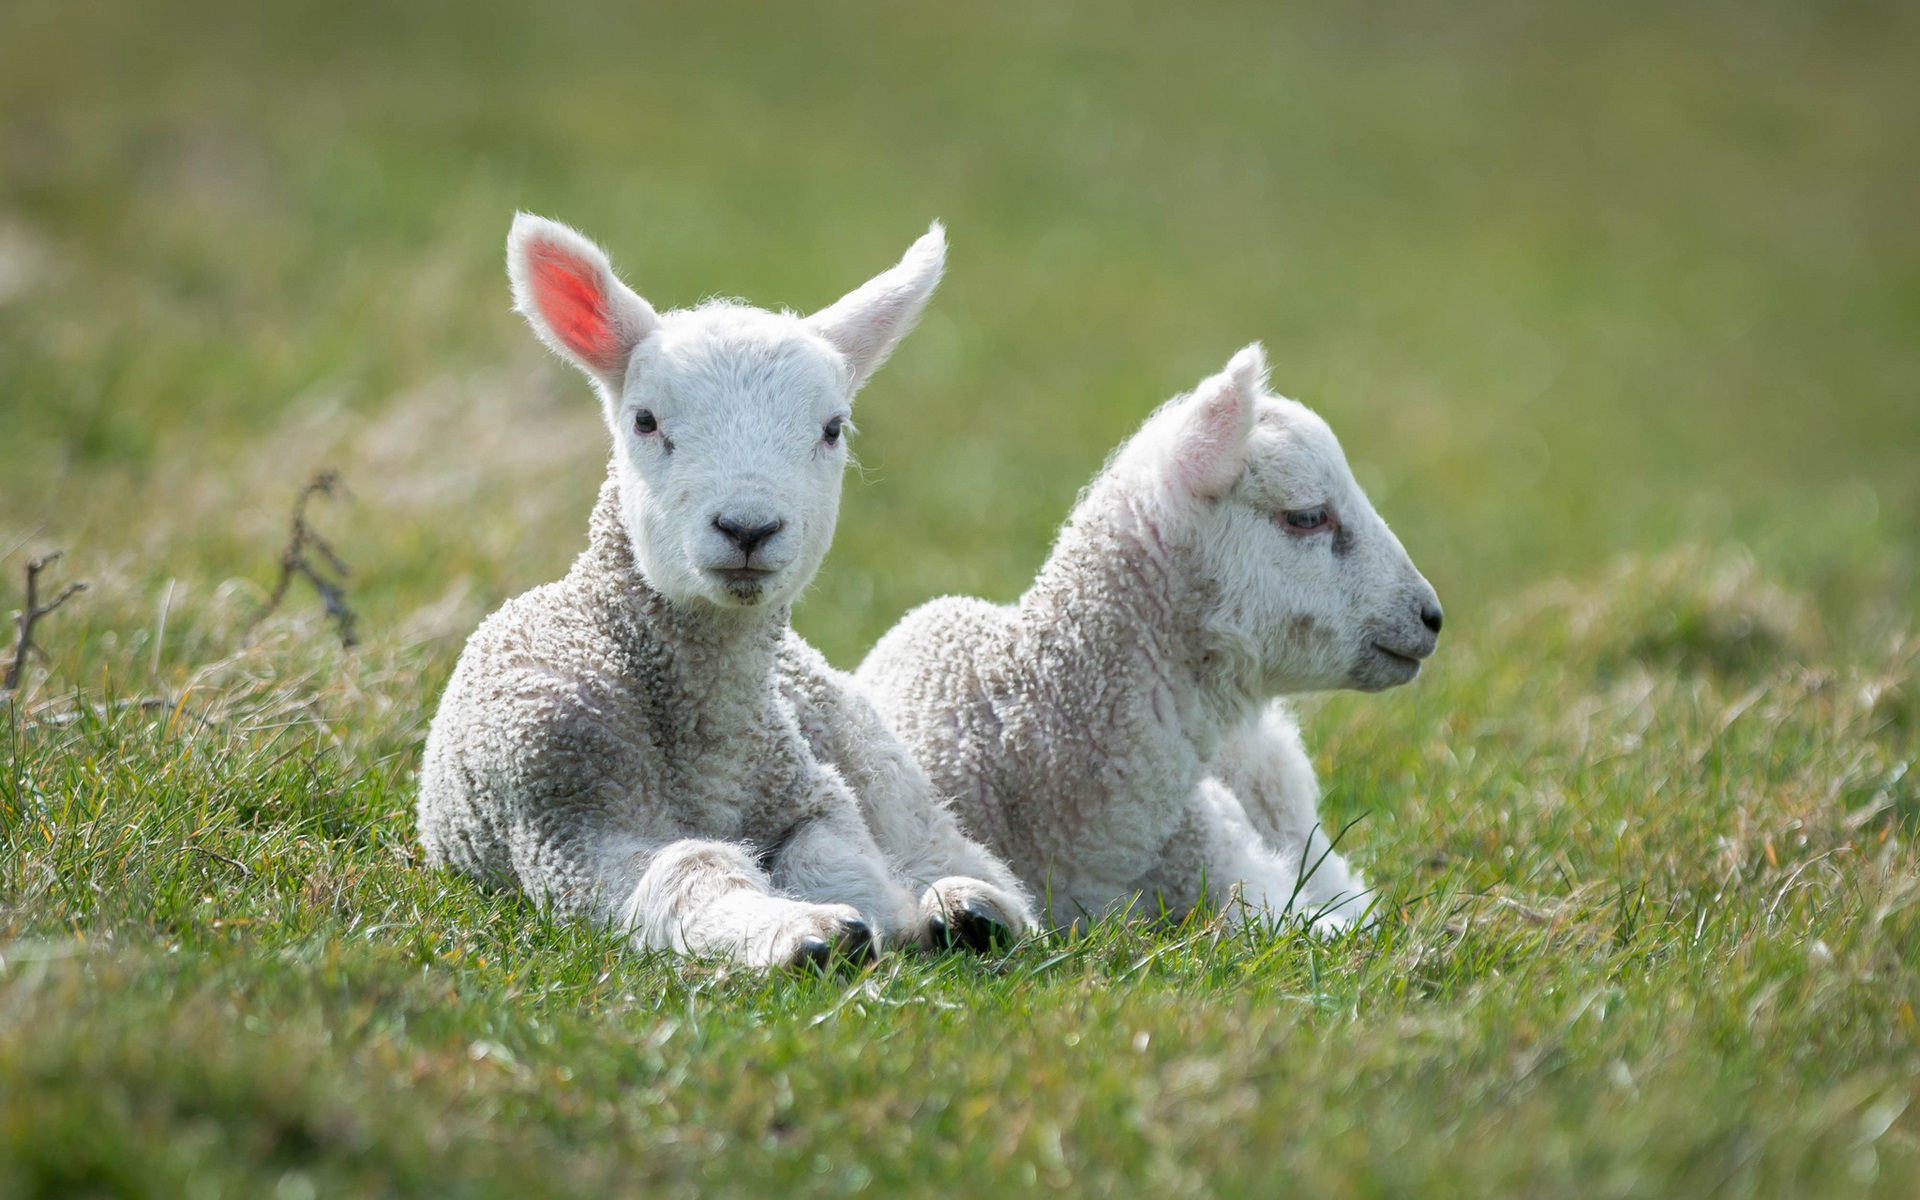 White Sheep Lambs Grass Wallpaper 1920x1200 Resolution